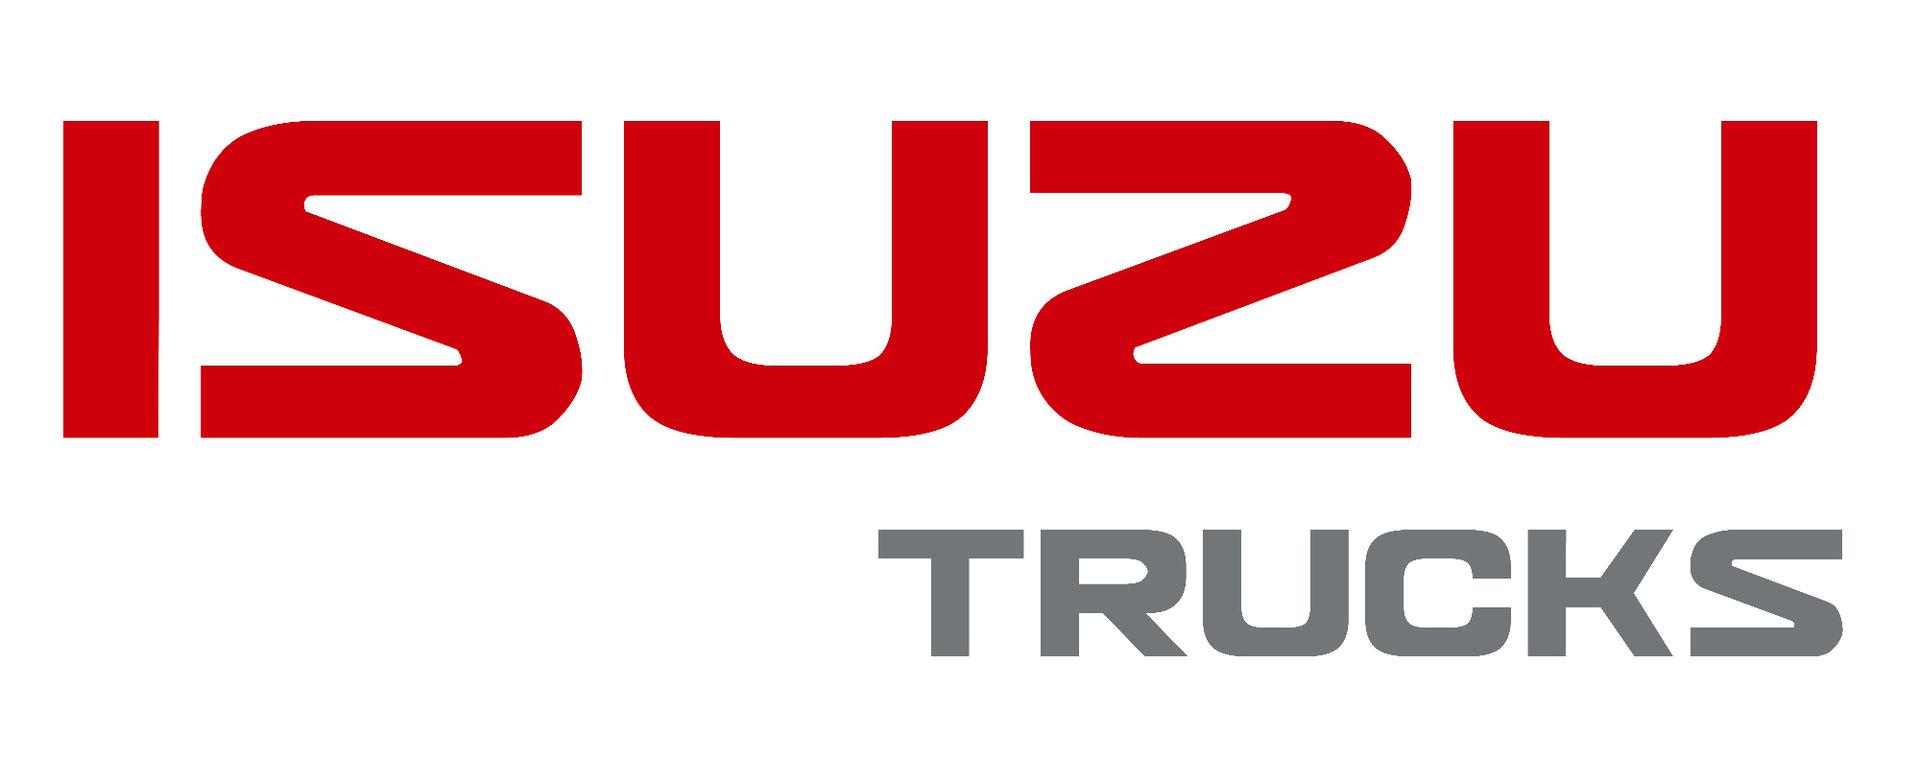 1999 Ftr Isuzu Truck Wiring Diagrams